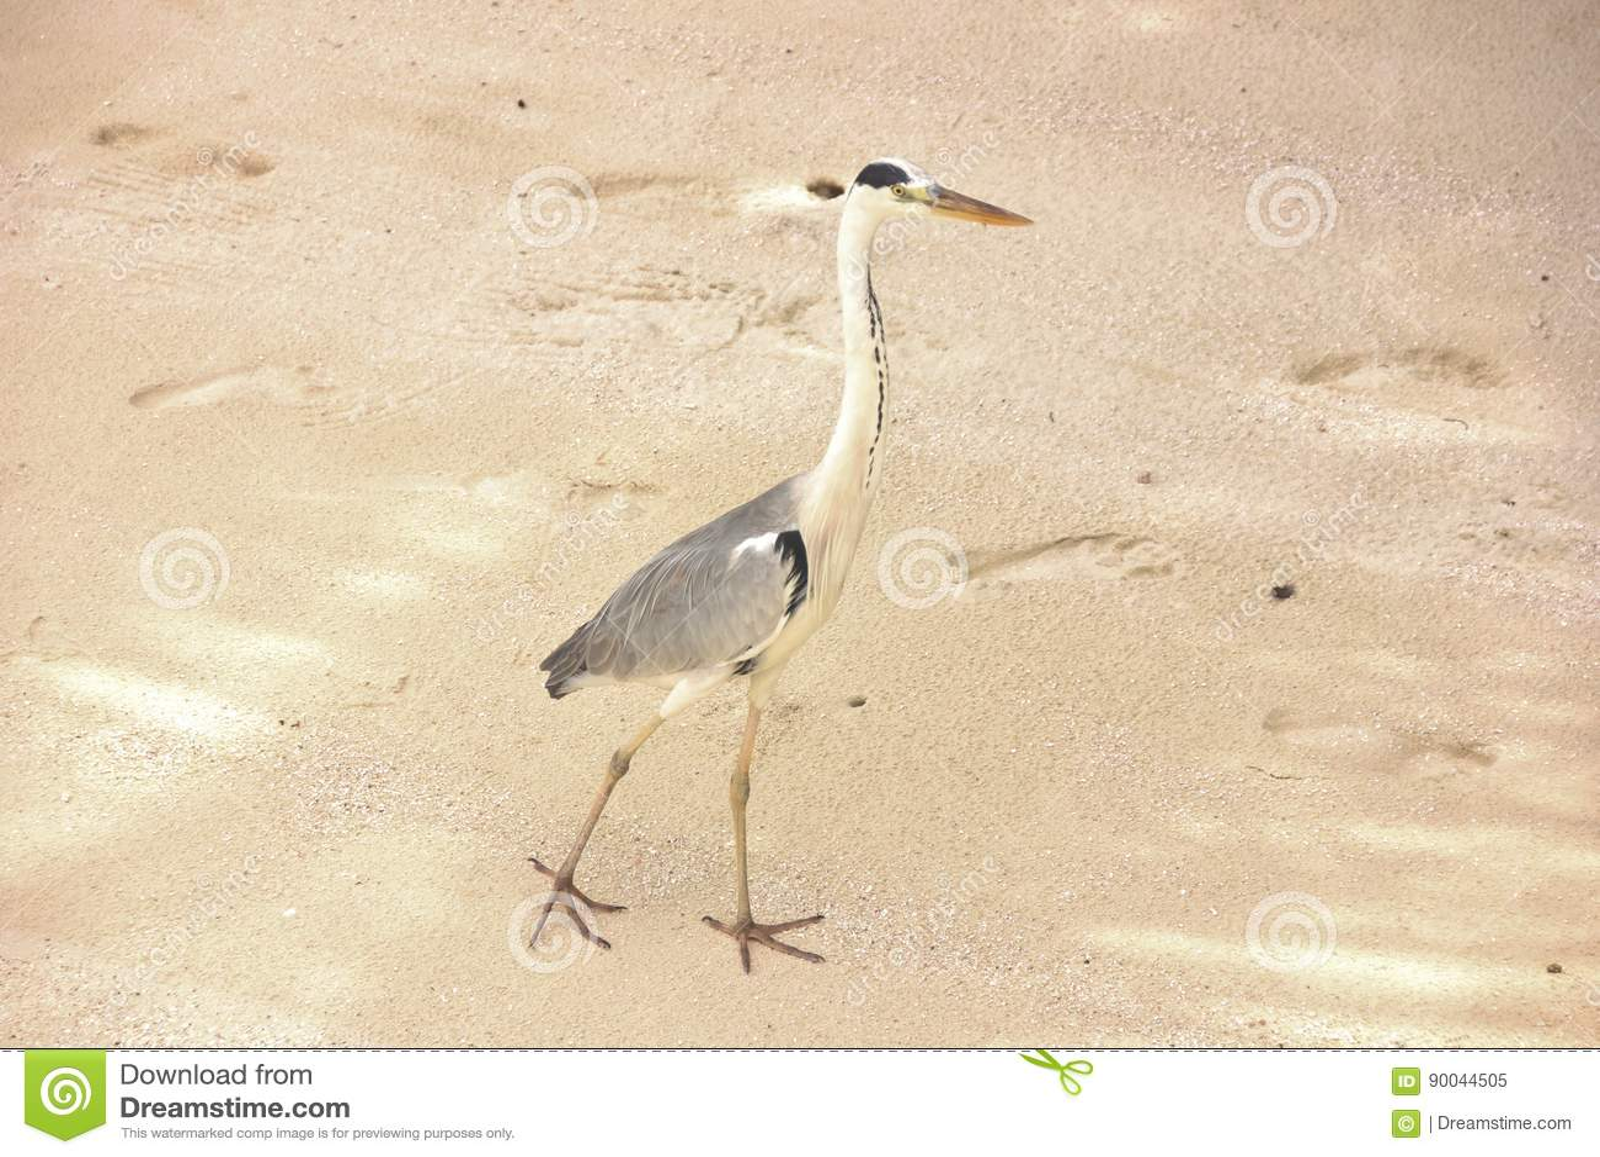 Heron bird walking on the sand, Maldives